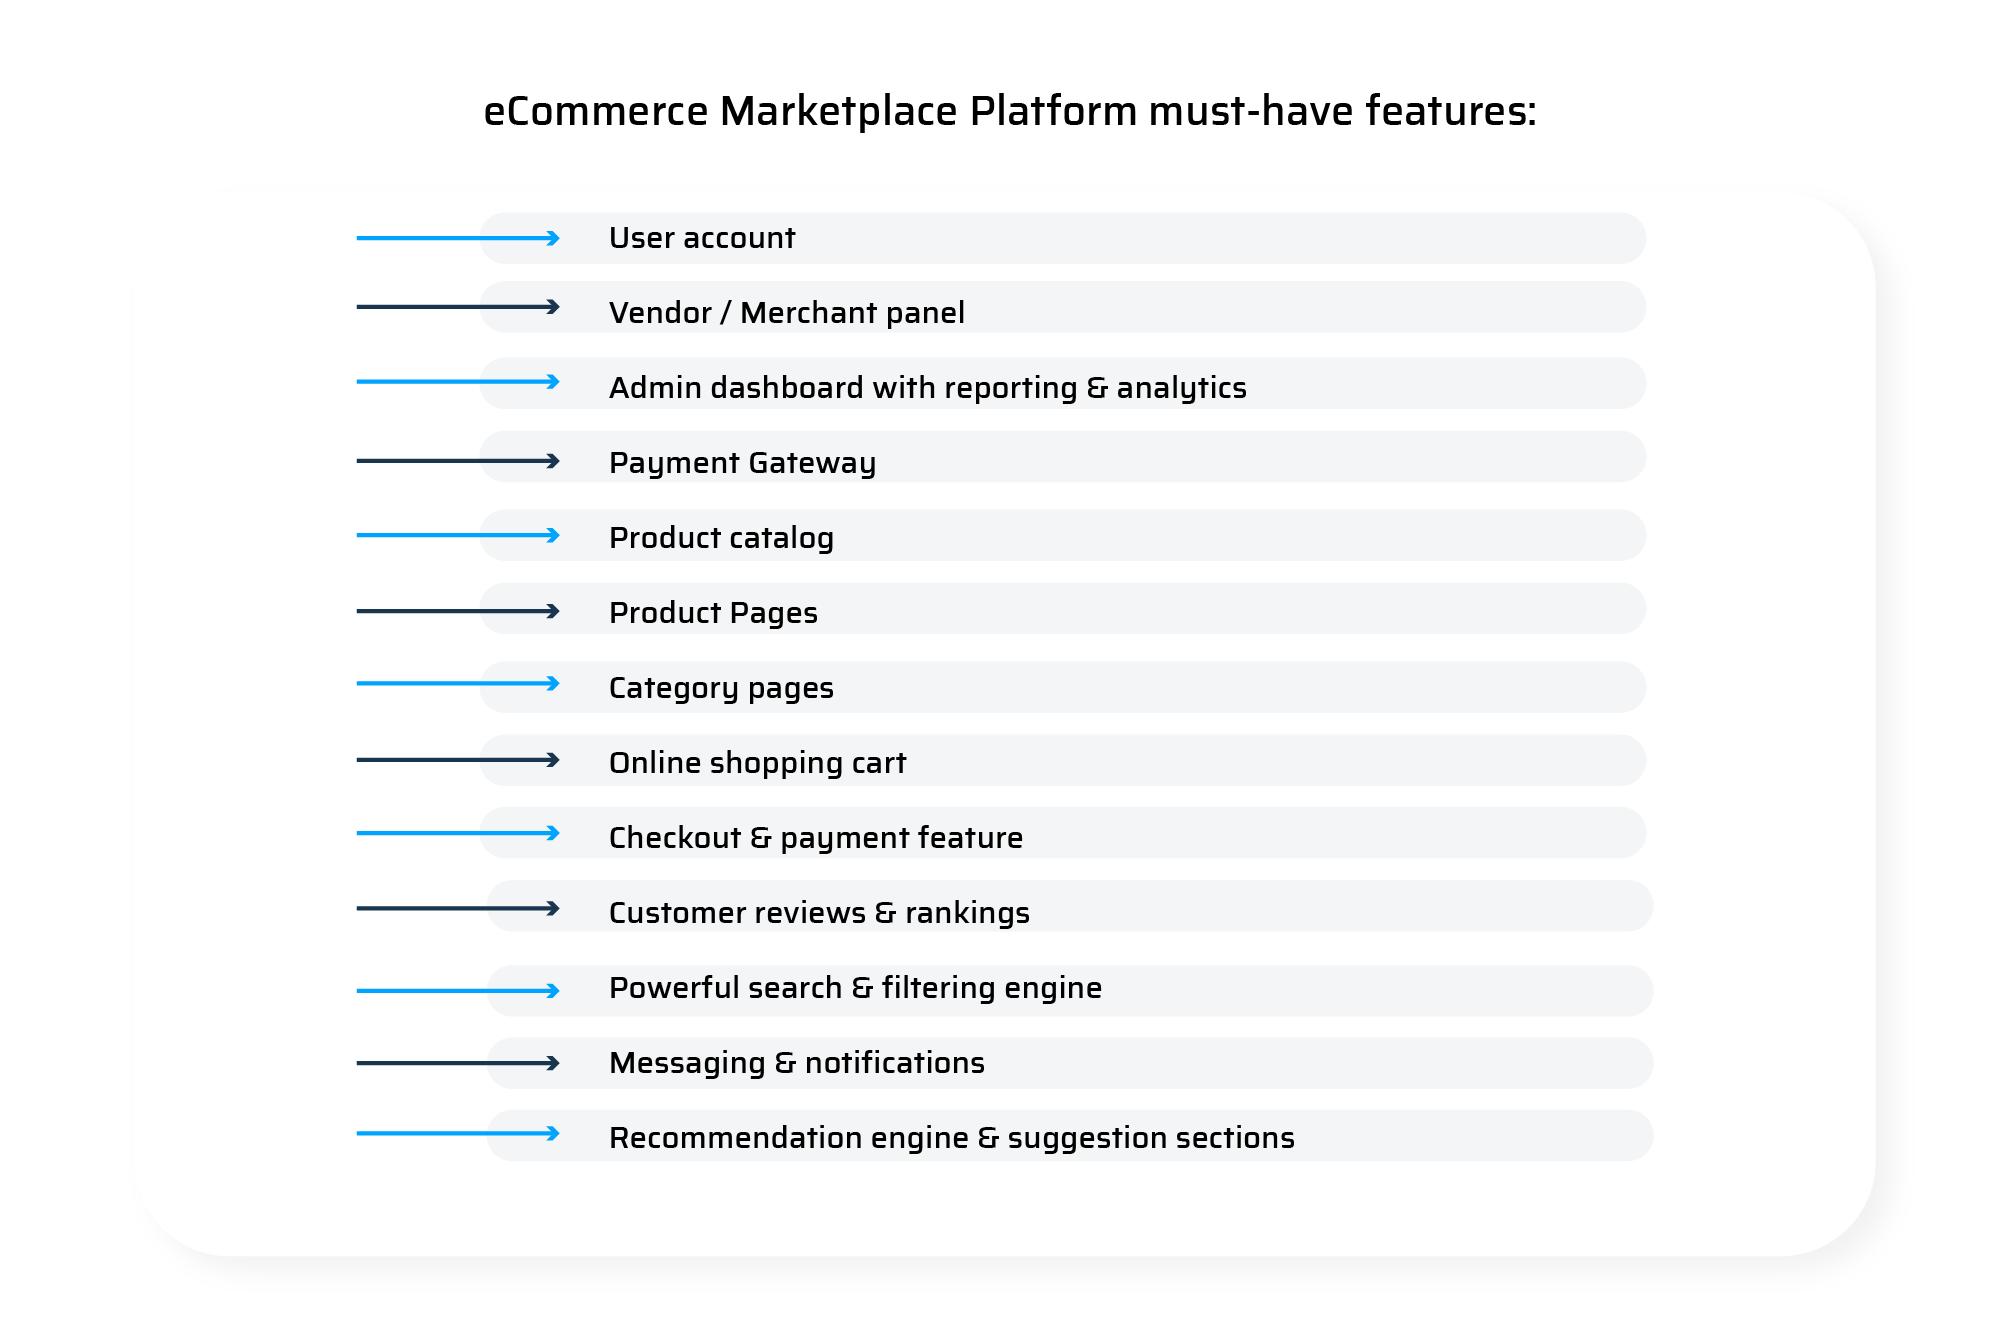 ecommerce marketplace platform must-have